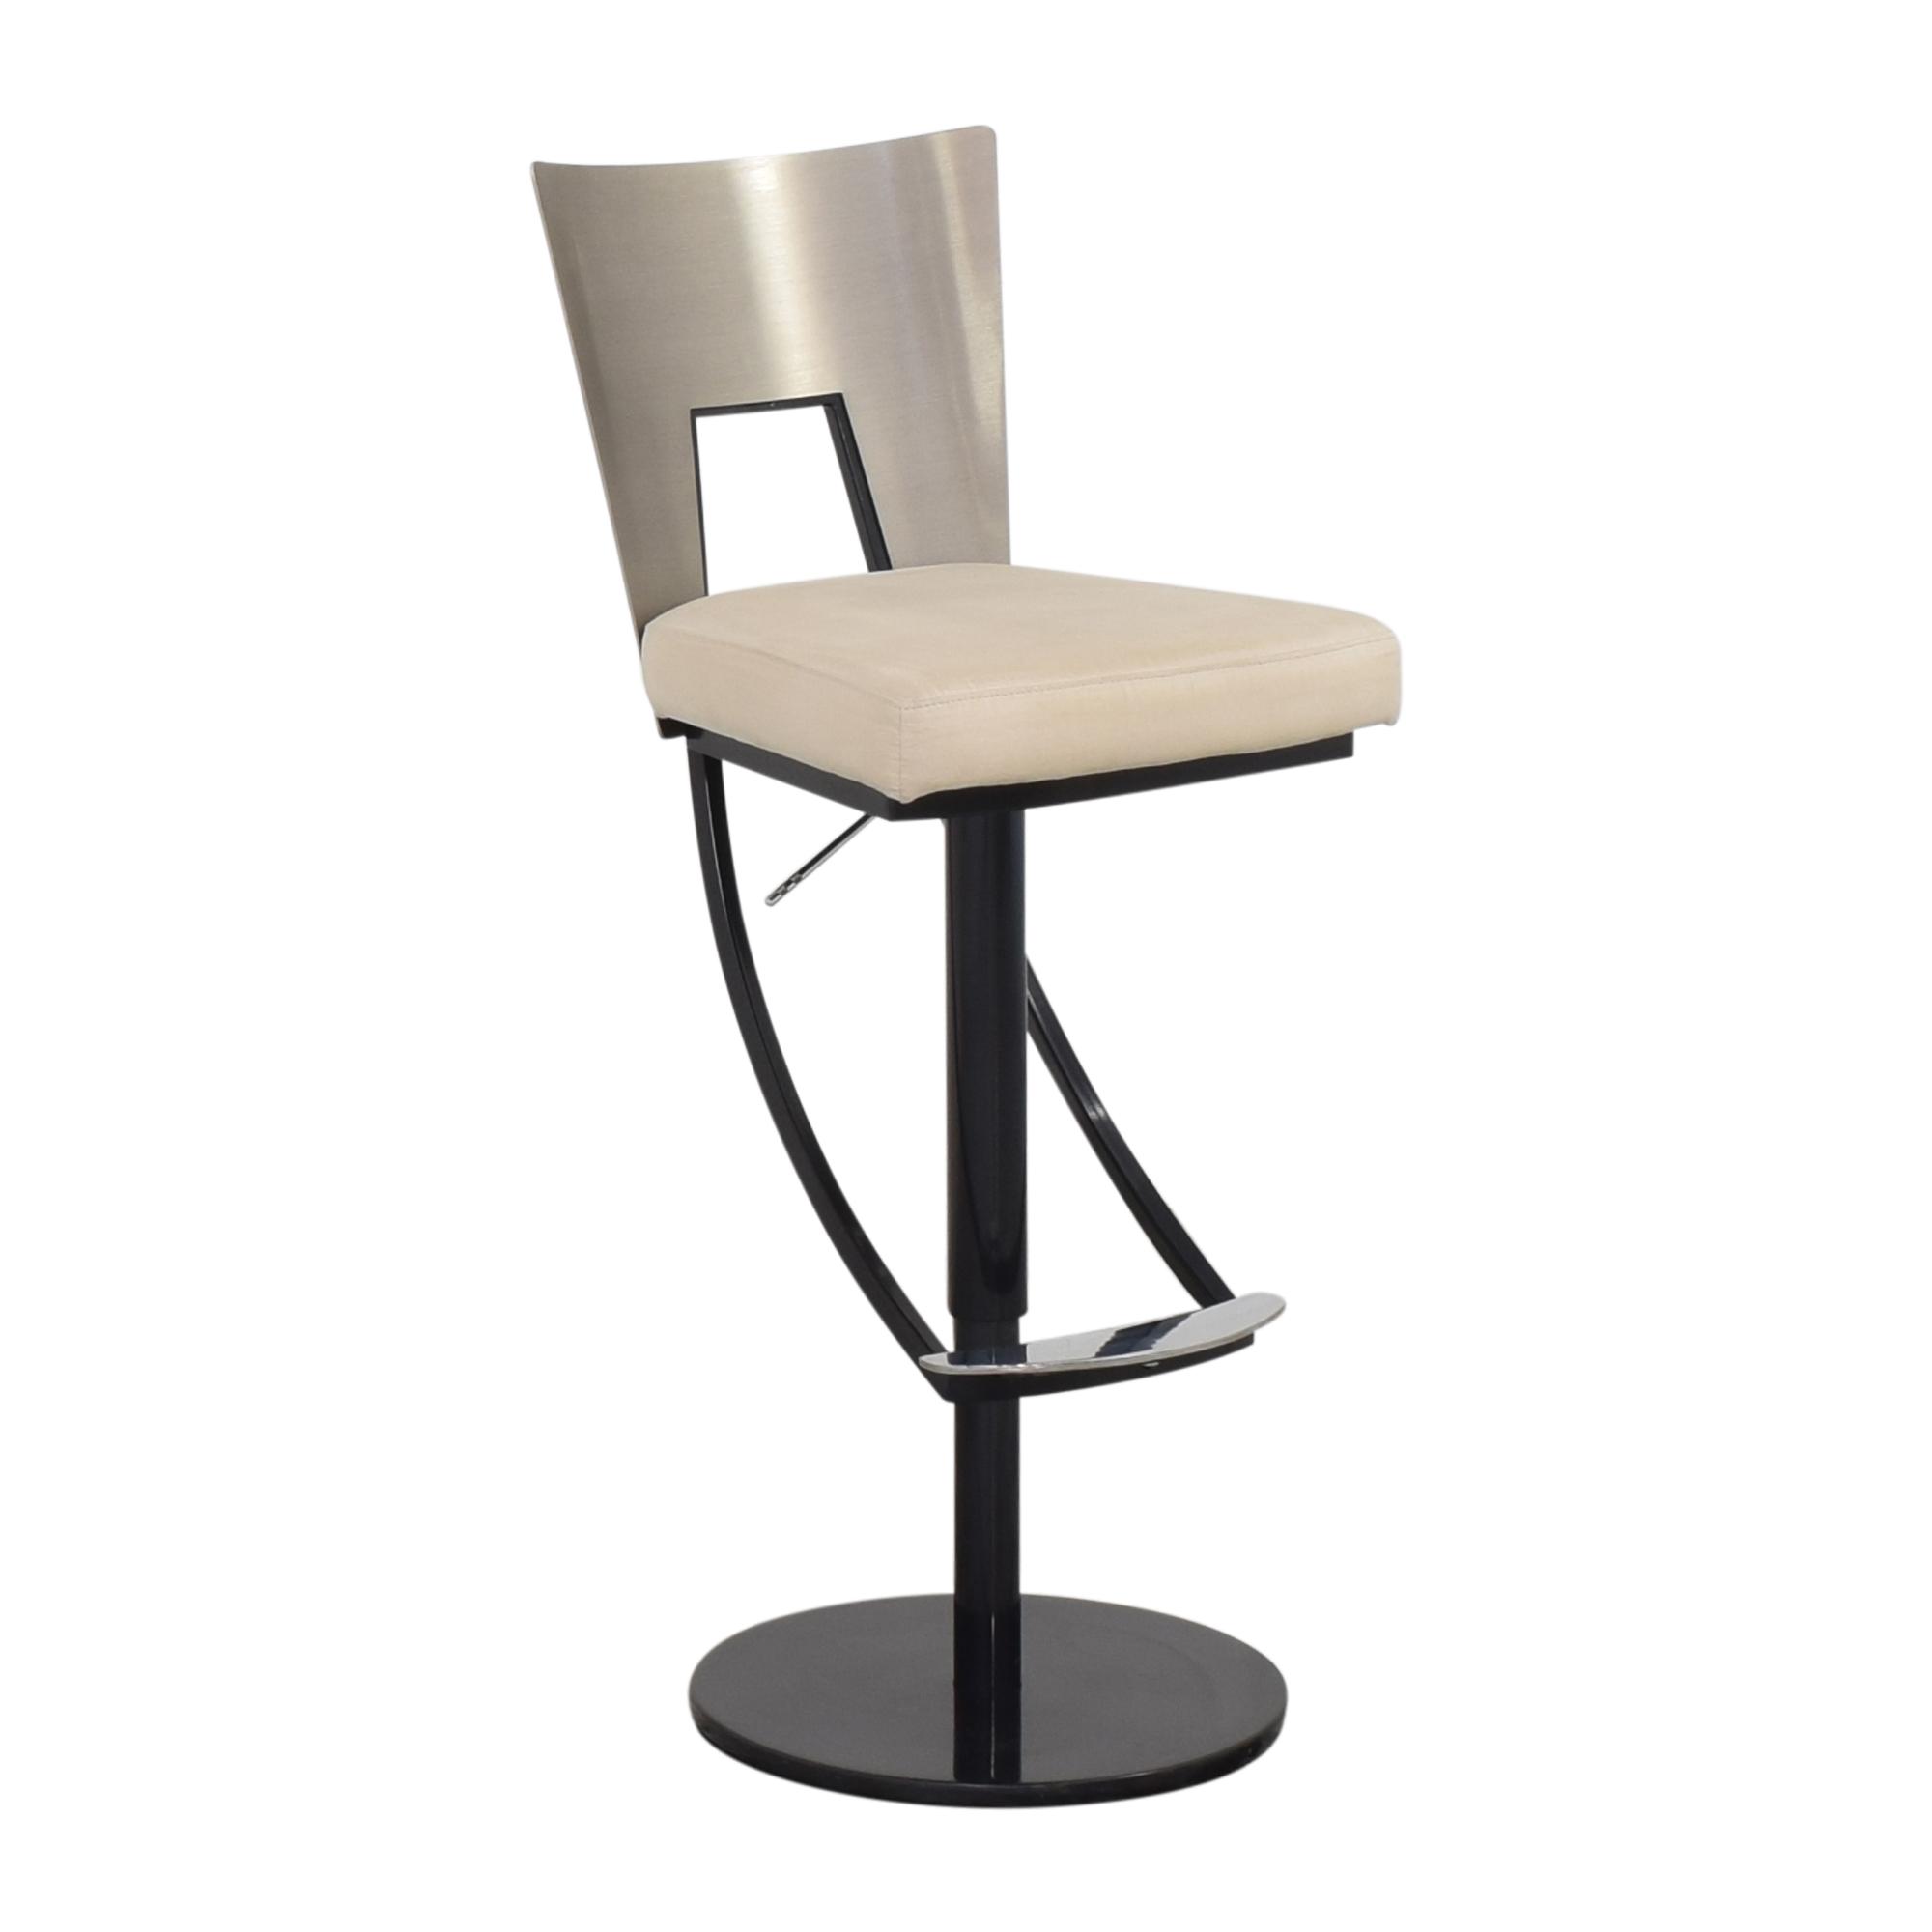 shop Elite Modern Regal Bar Stool Elite Modern Chairs